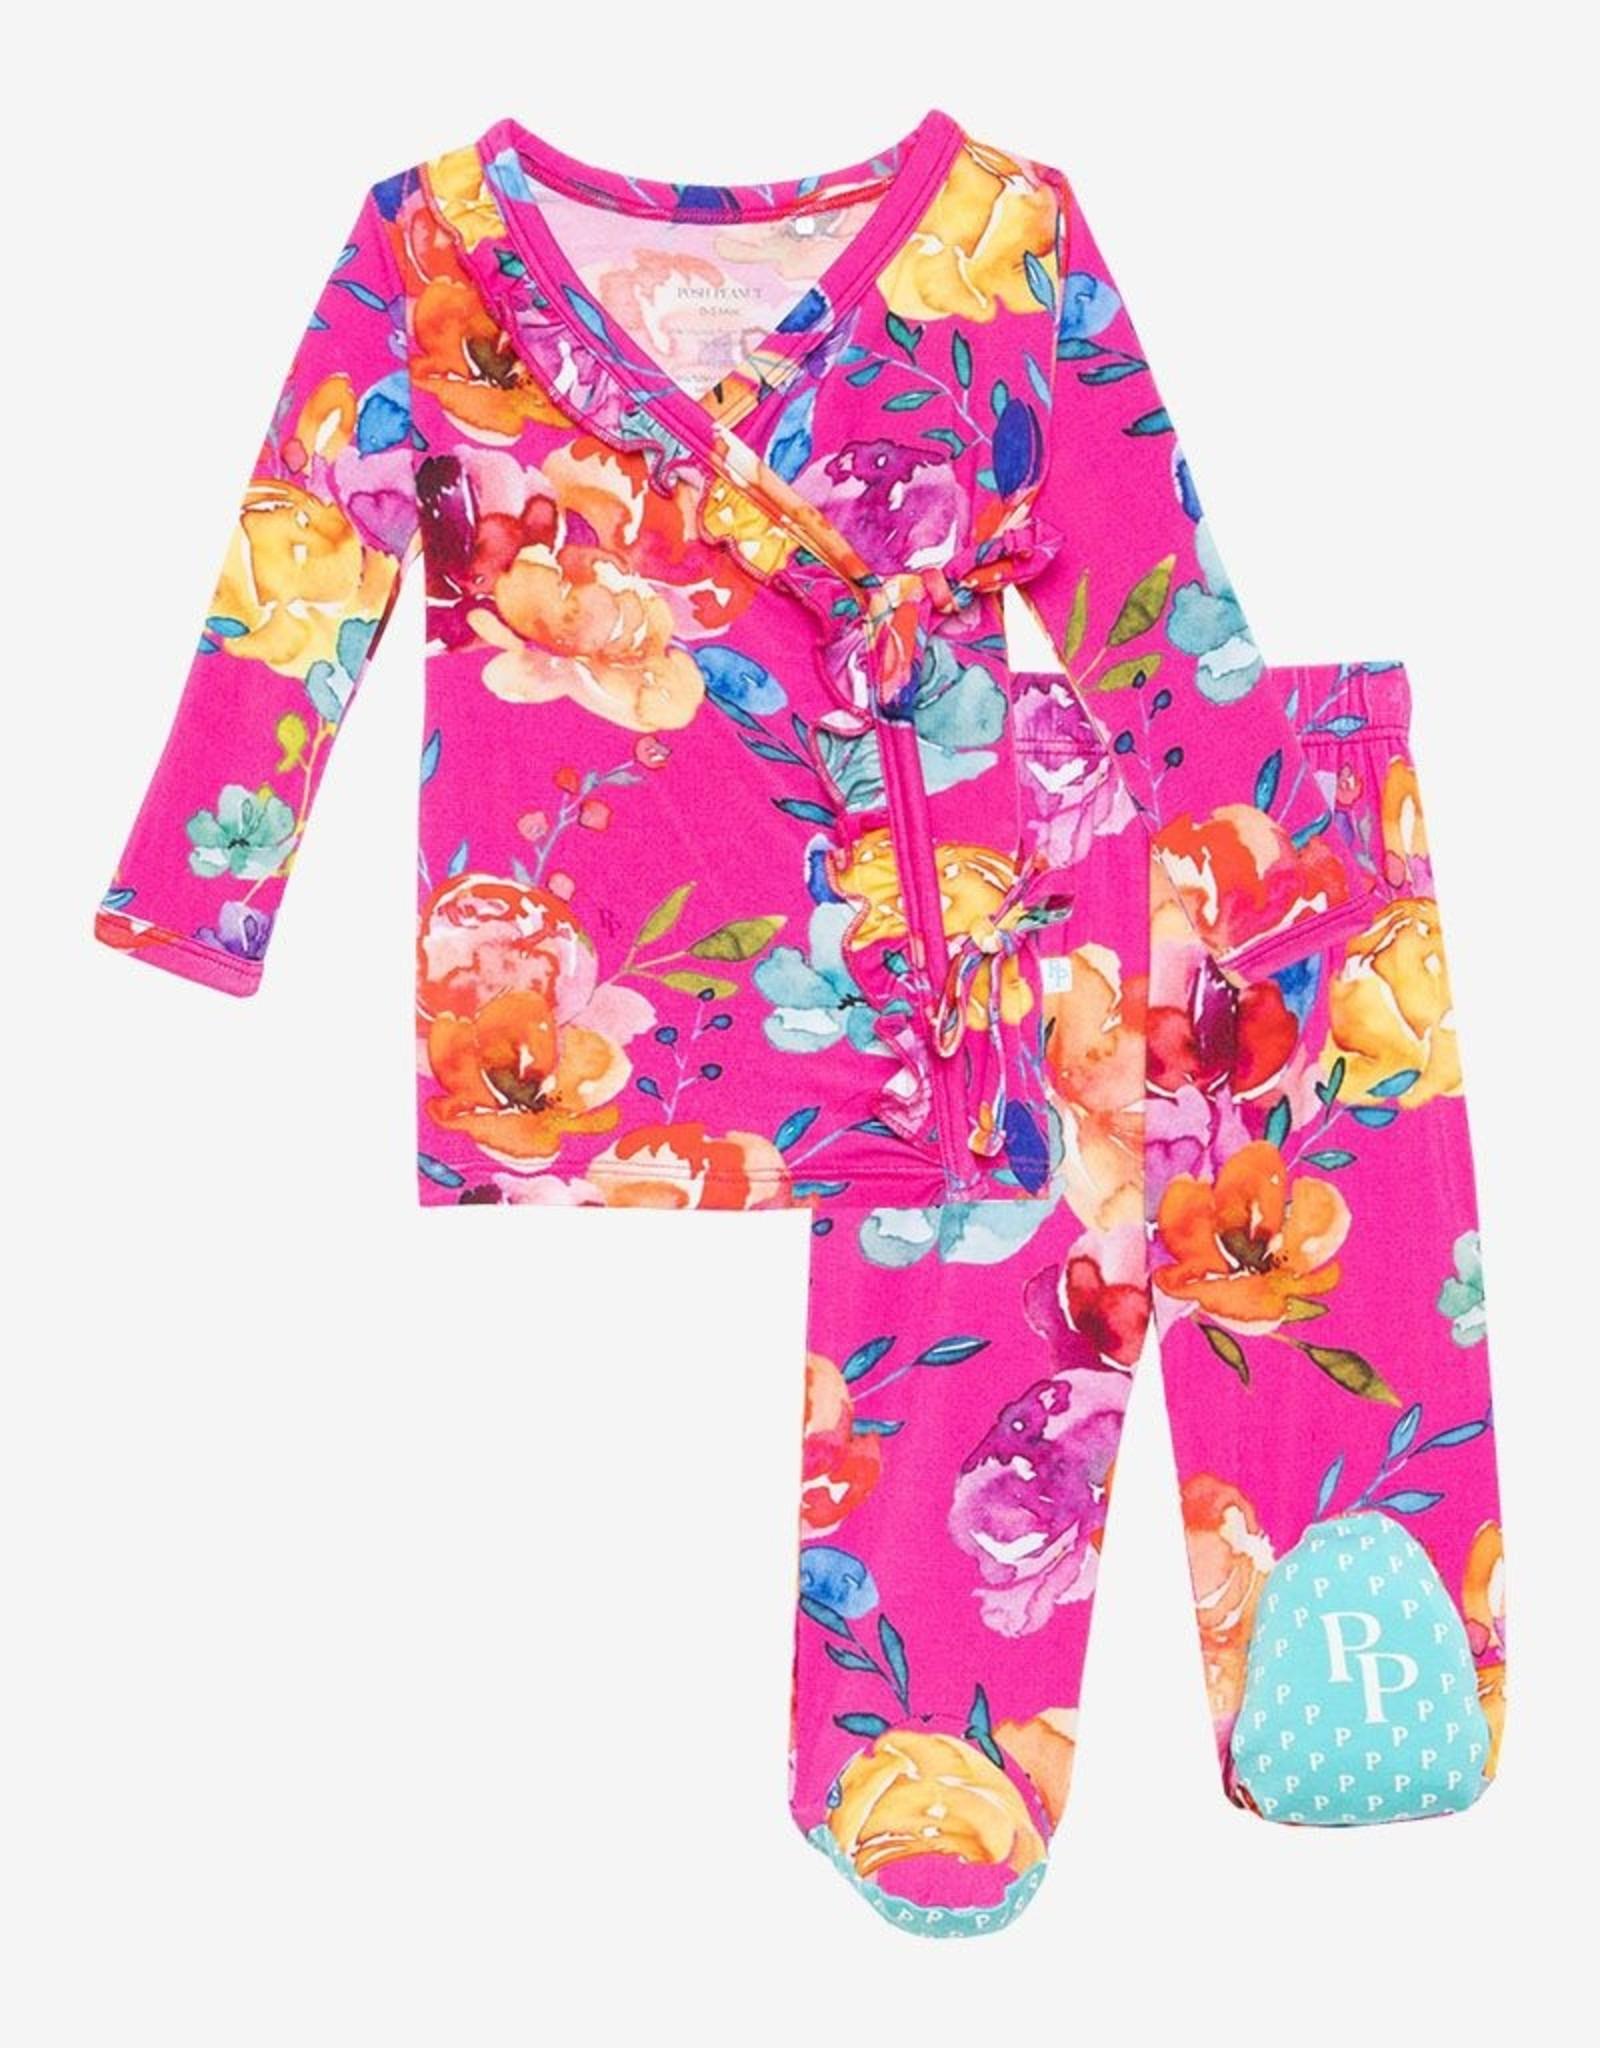 Posh Peanut Aminatu Ruffled Kimono 0-3 months